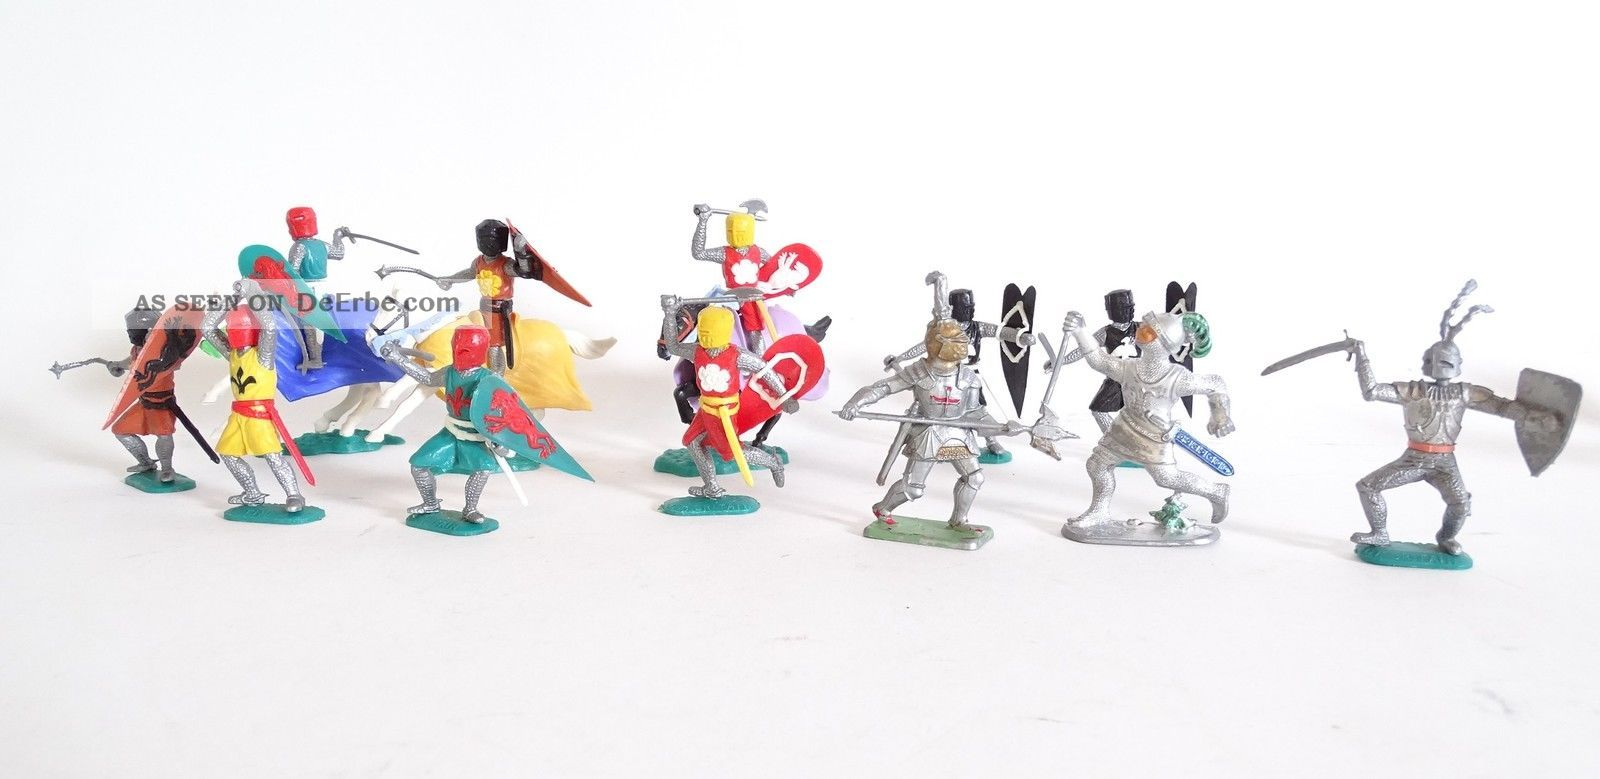 Großes Konvolut Timpo Toys Topfhelm Ritter Seltene Varianten Raritäten Gefertigt nach 1945 Bild